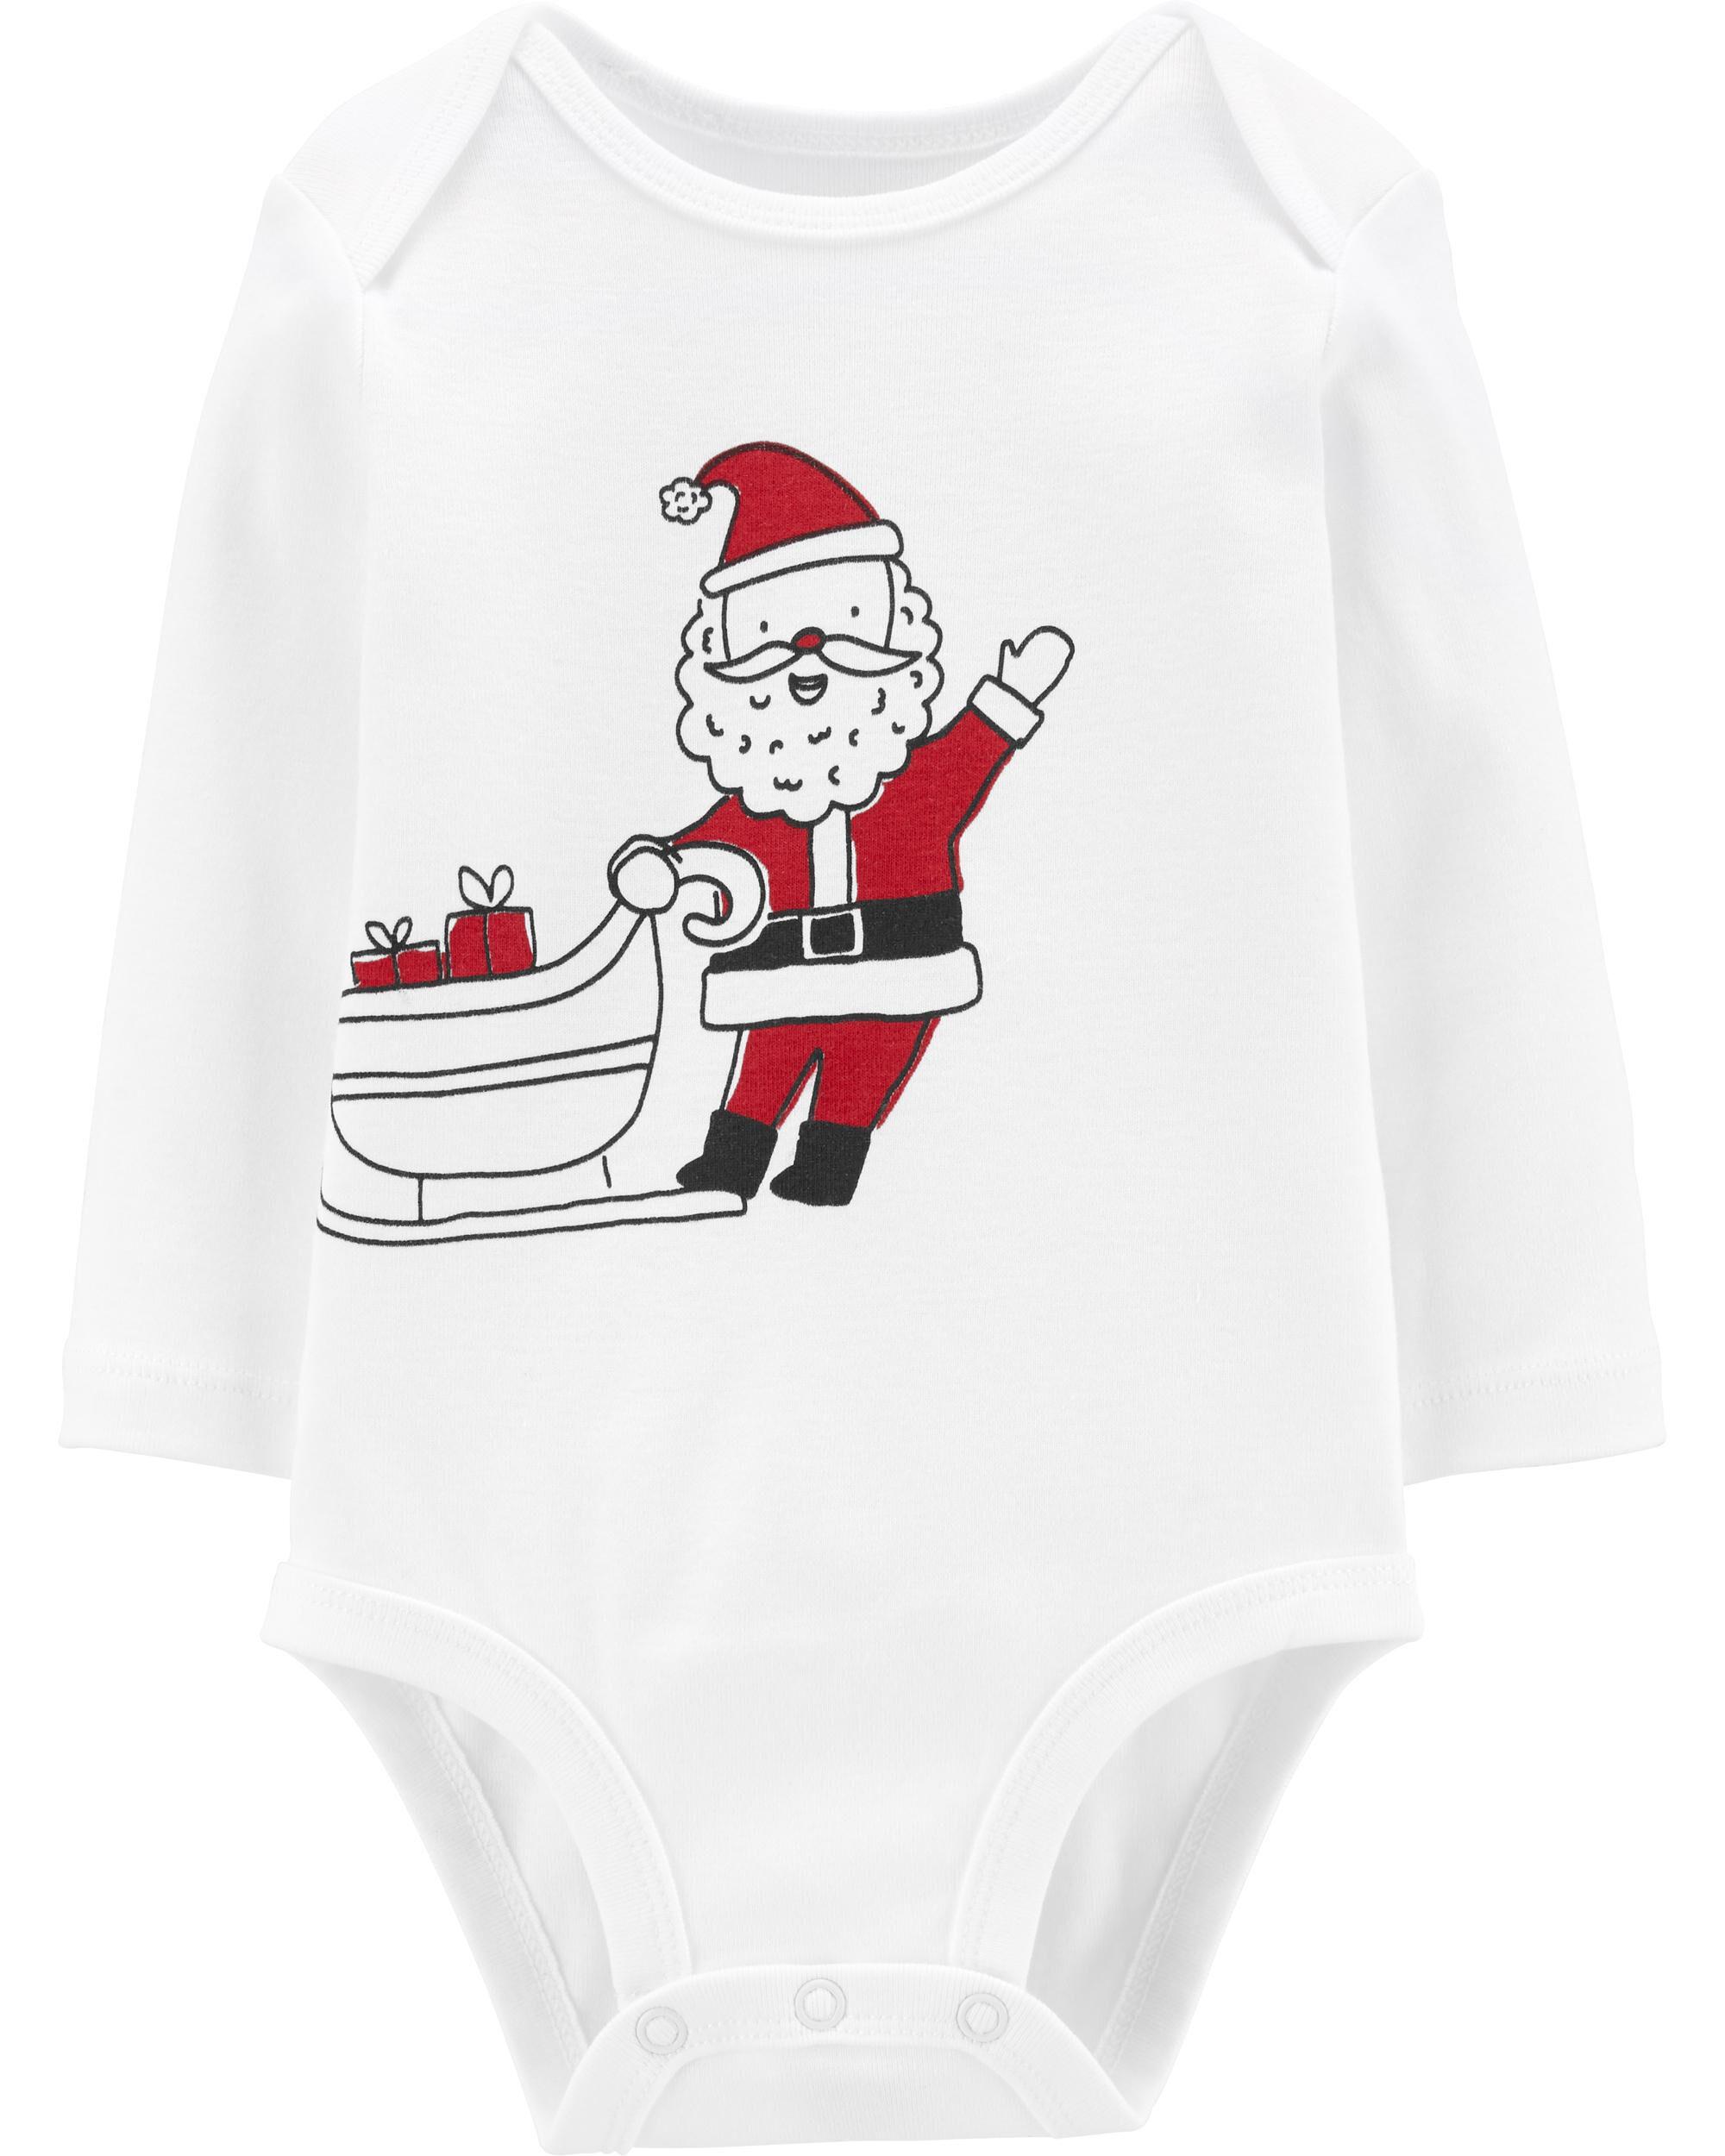 *CLEARANCE* Santa's Sleigh Collectible Bodysuit